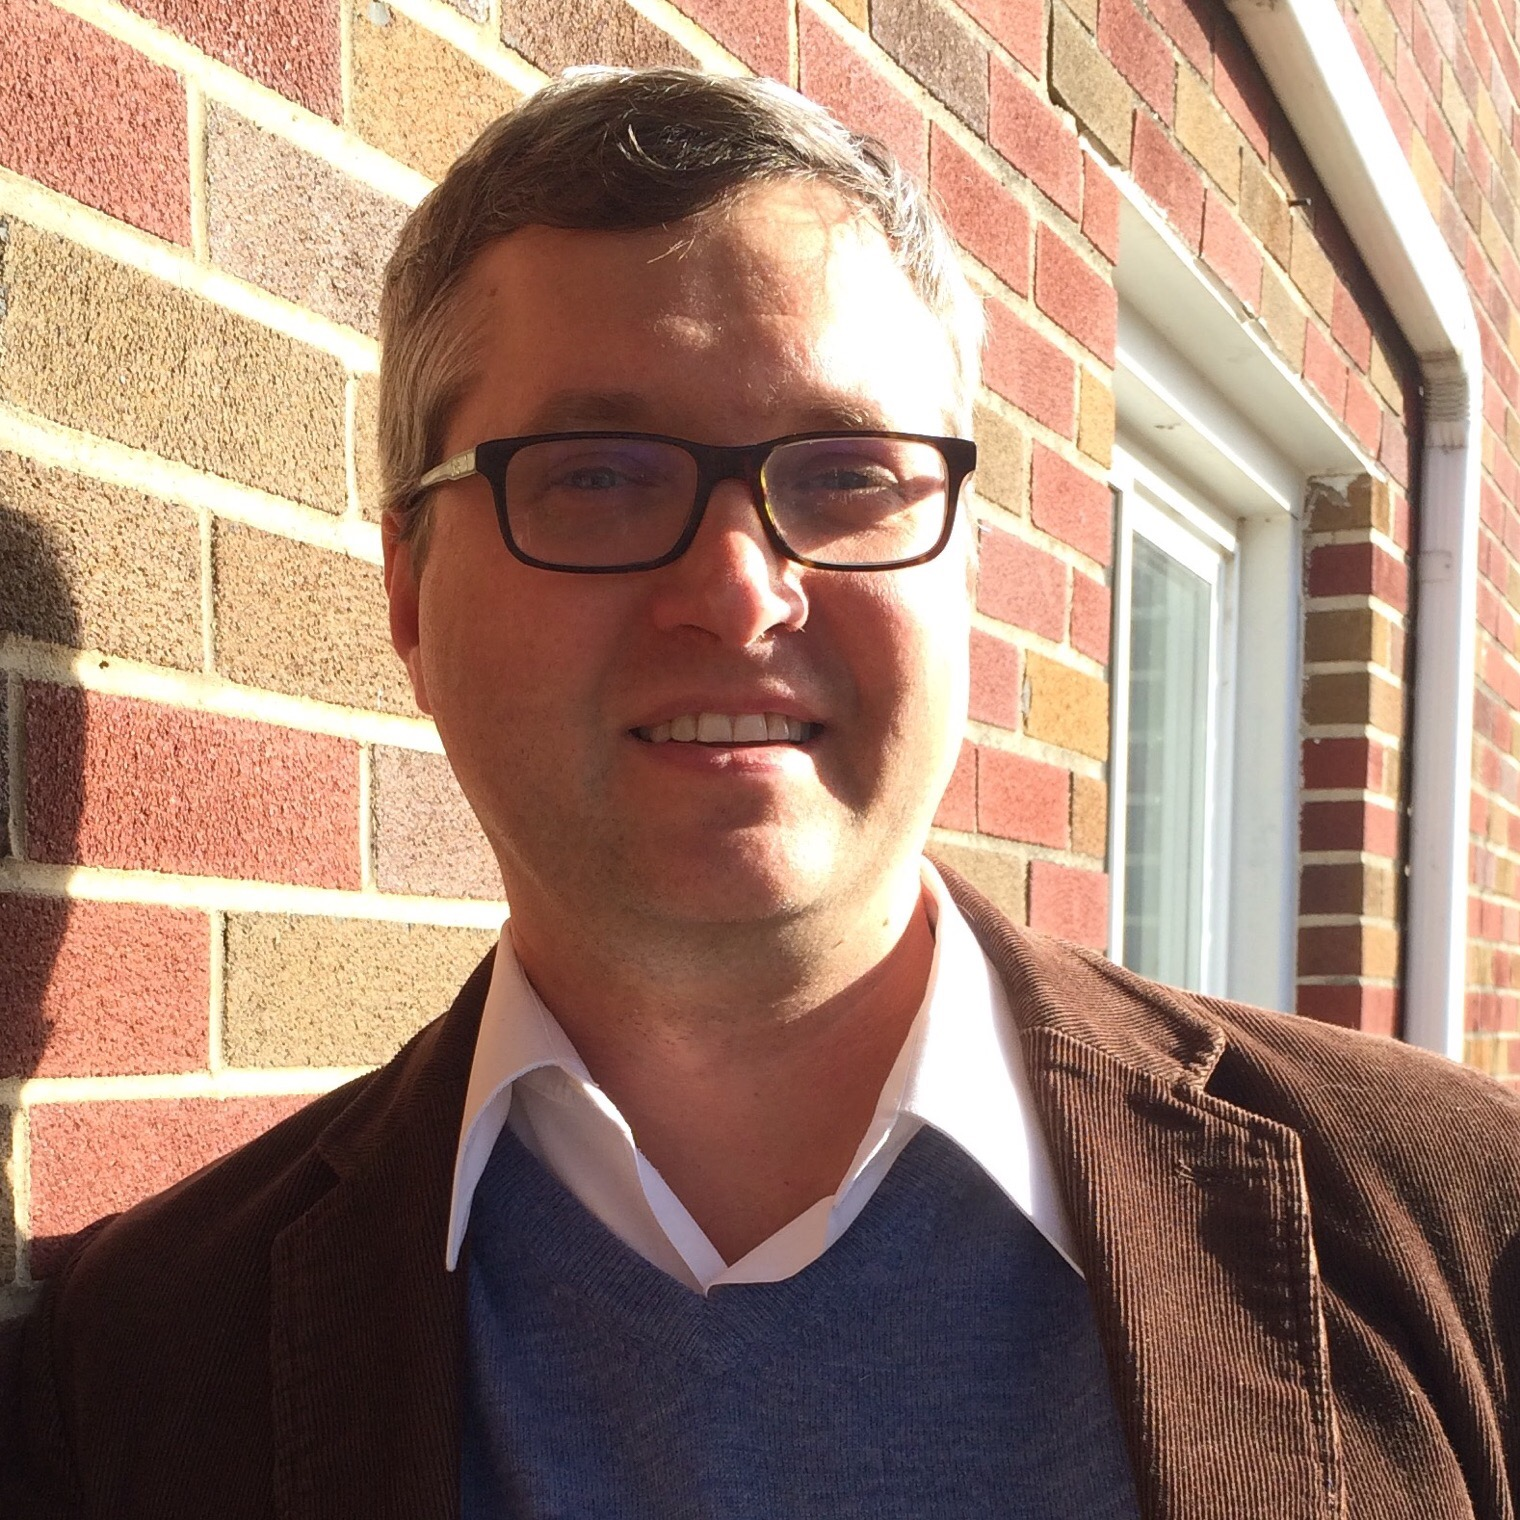 Kevin J. Gray